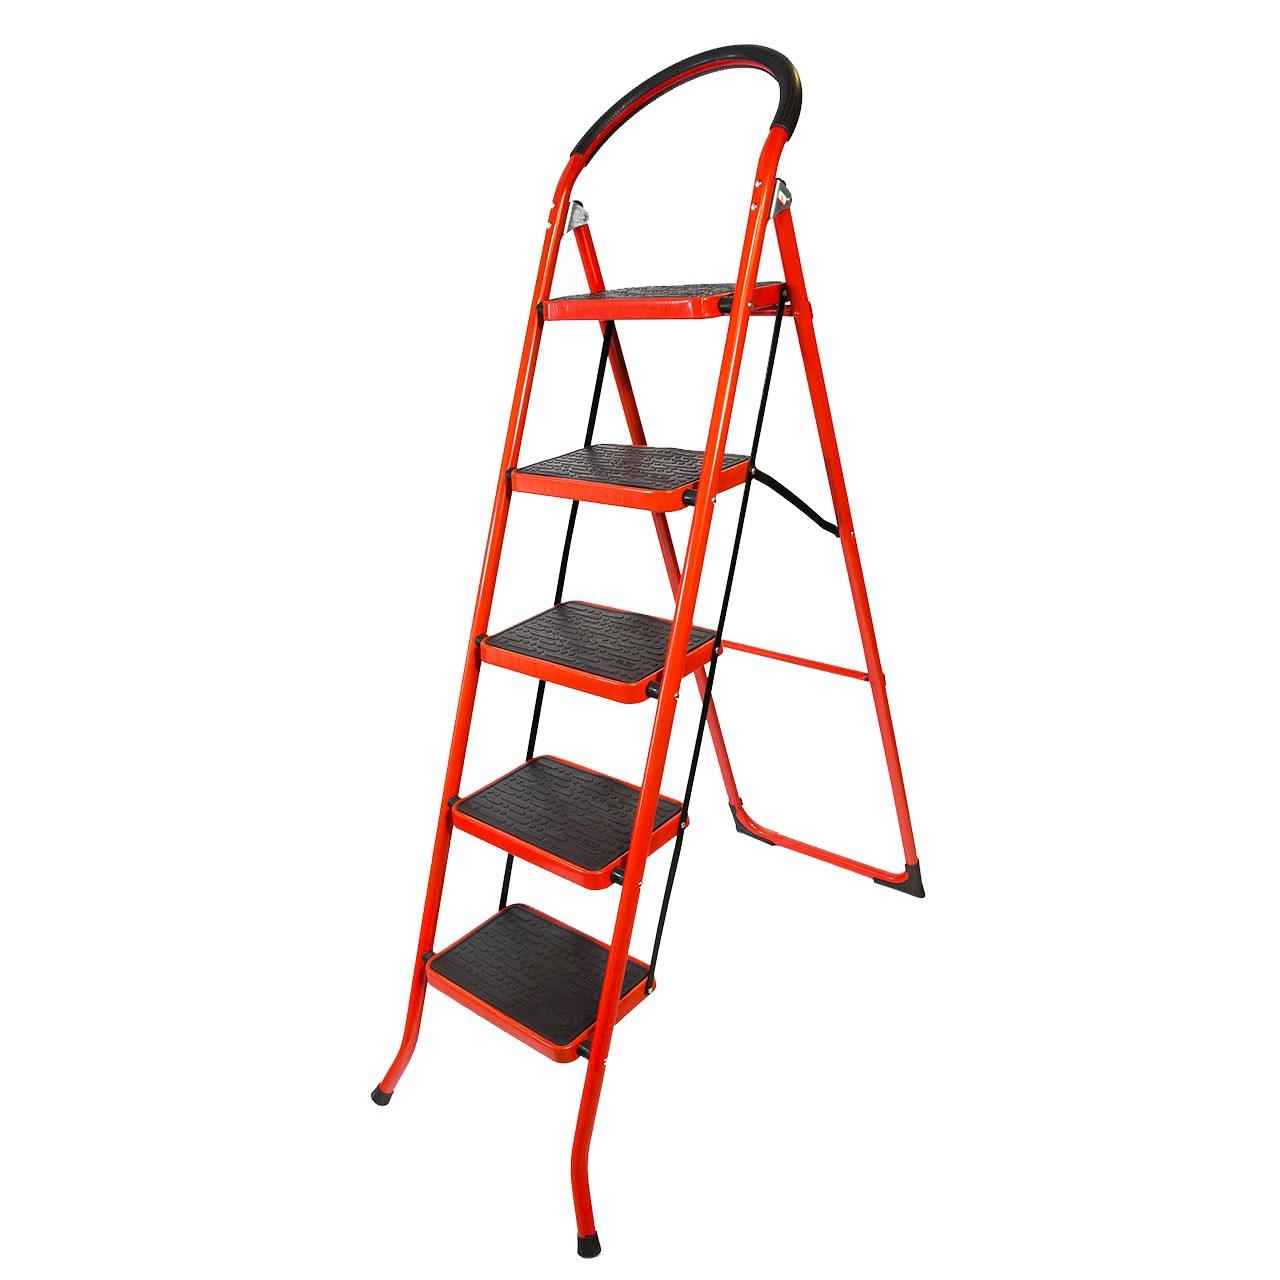 نردبان پنج پله دکور آسان مدل P5